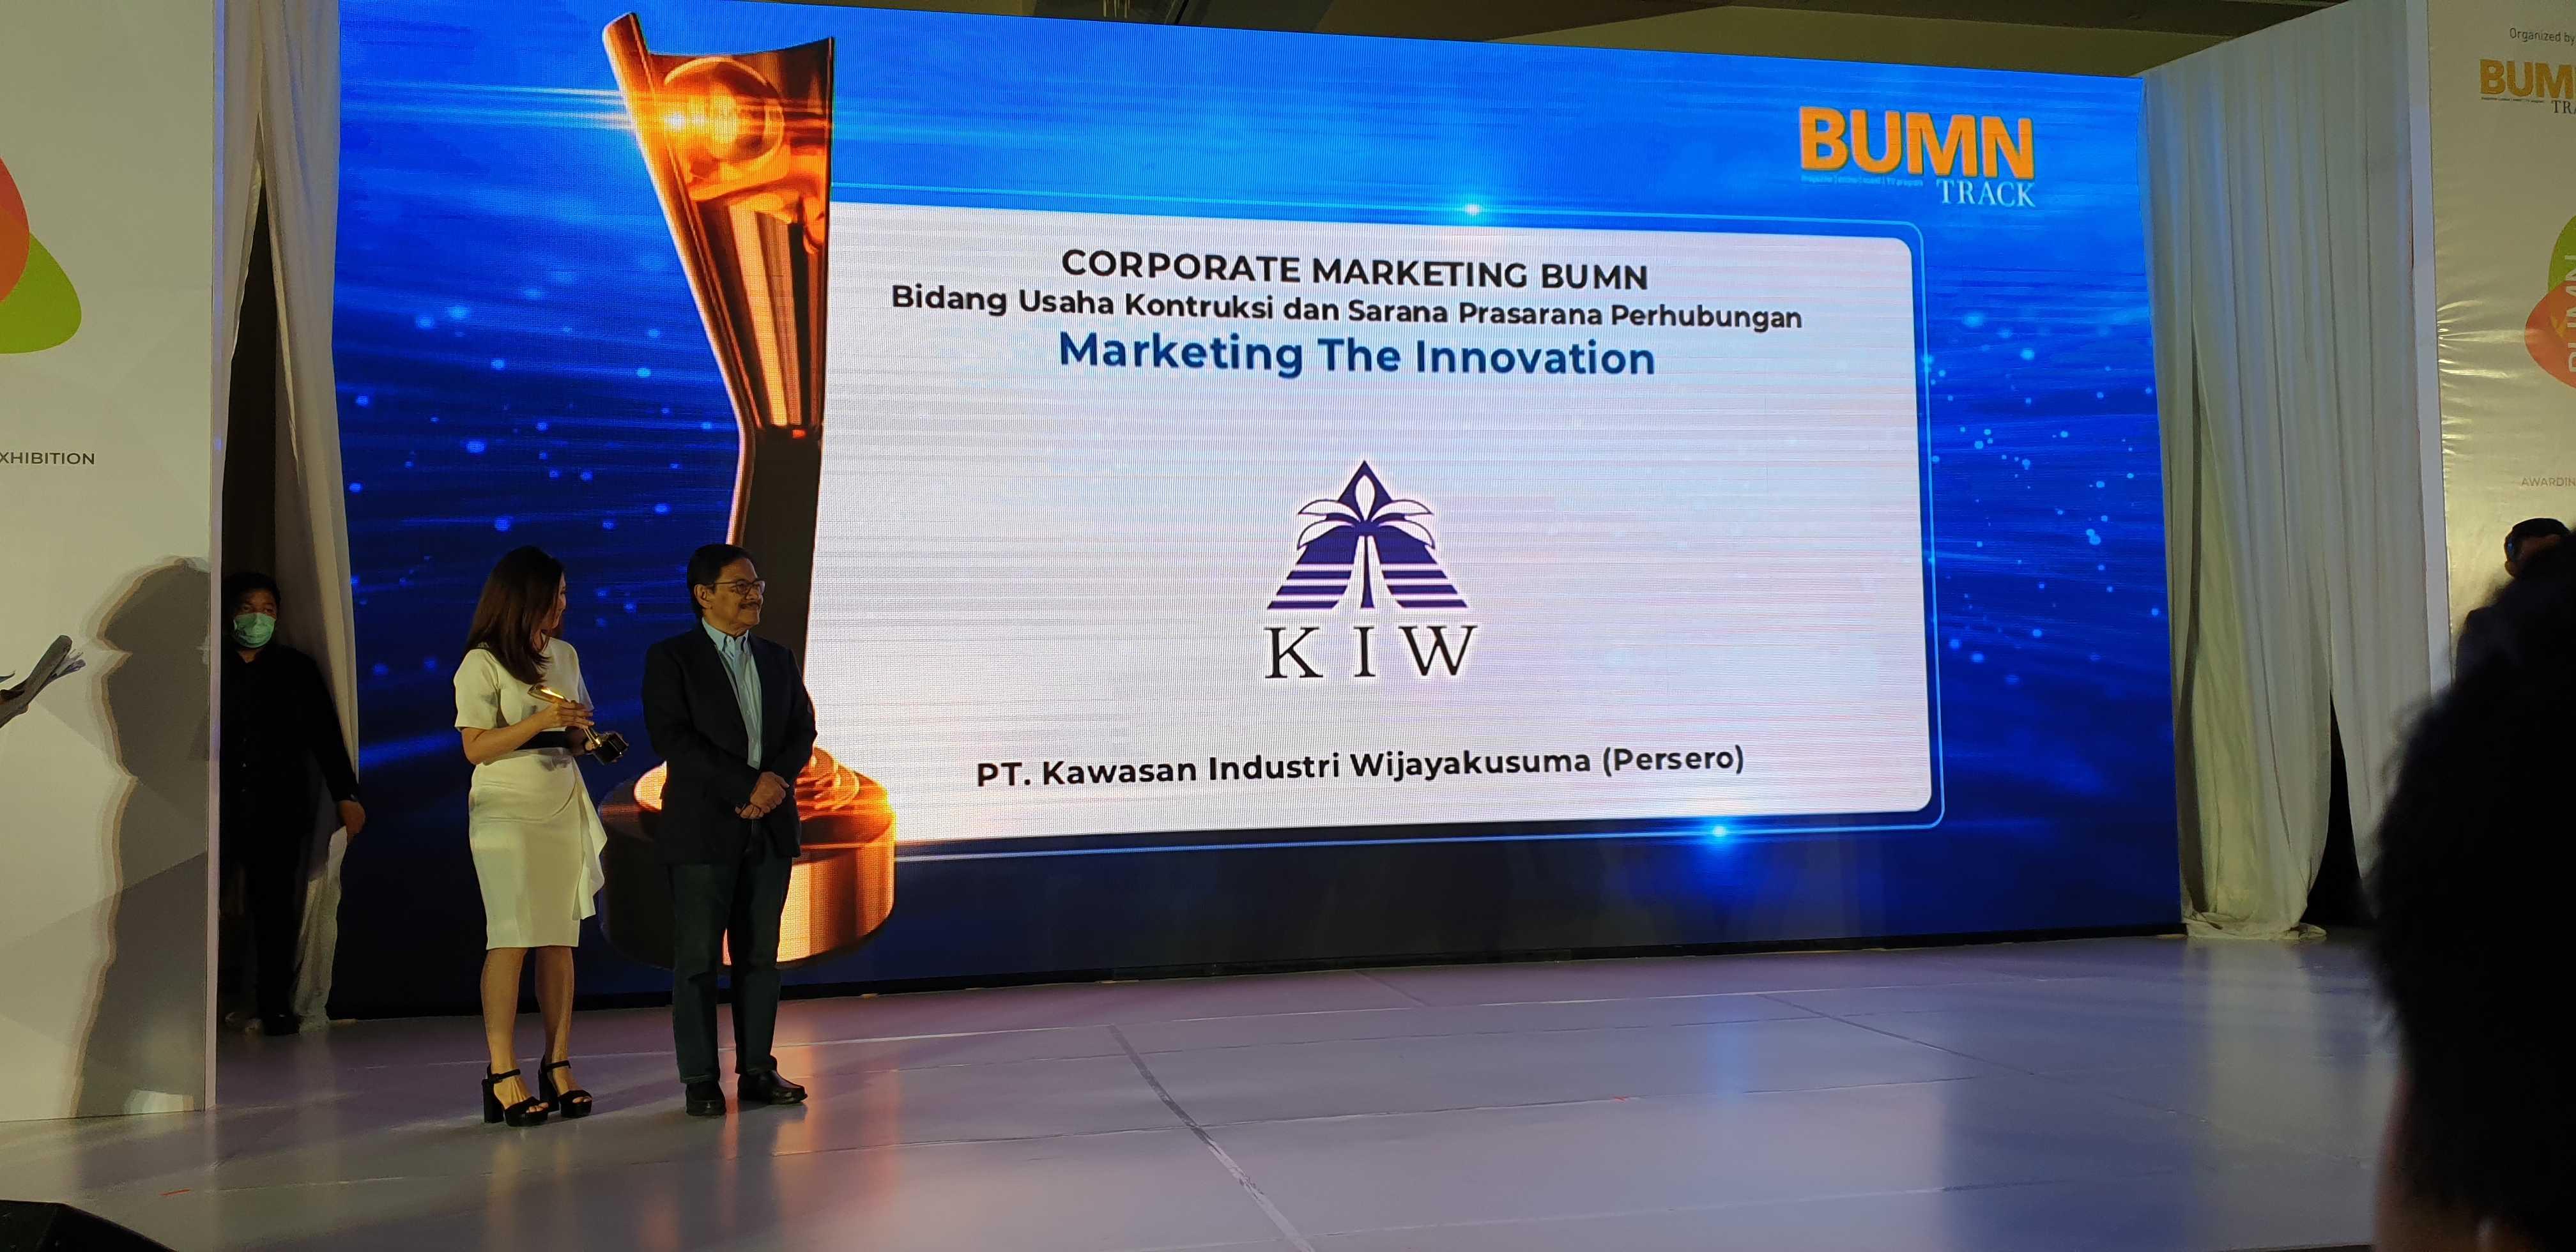 BUMN Branding & Marketing Award 2019